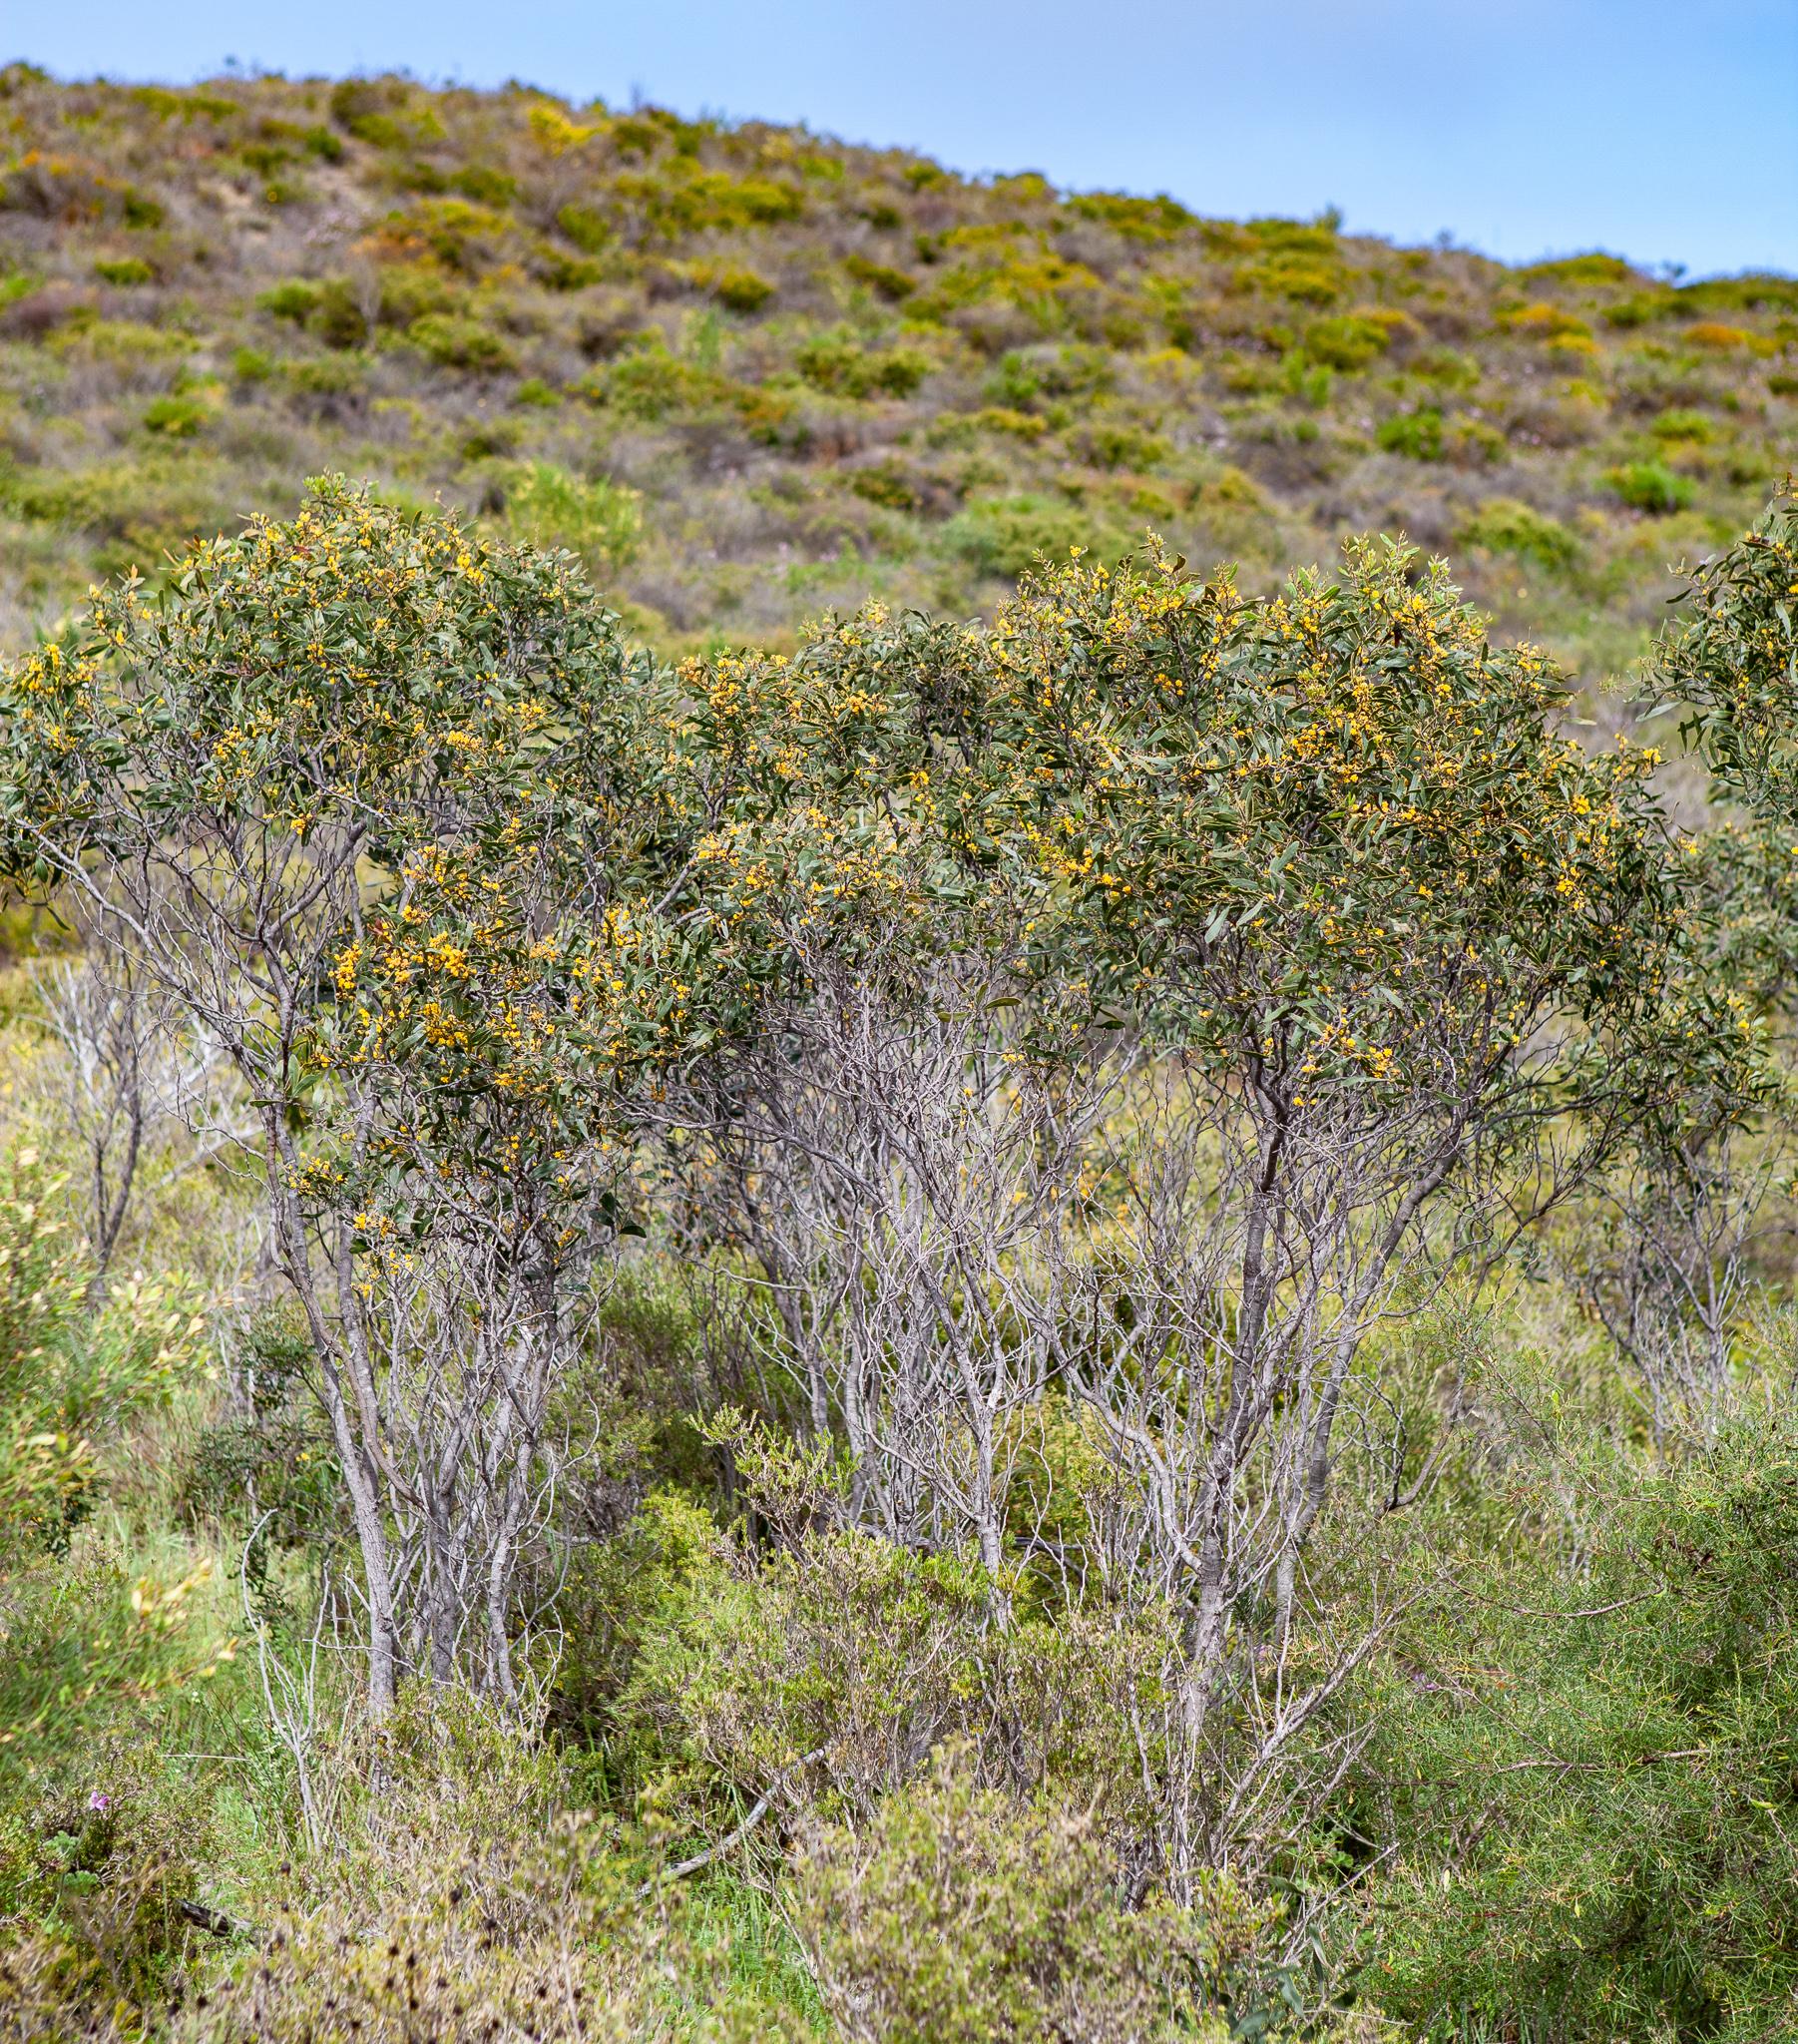 Summer-scented wattle